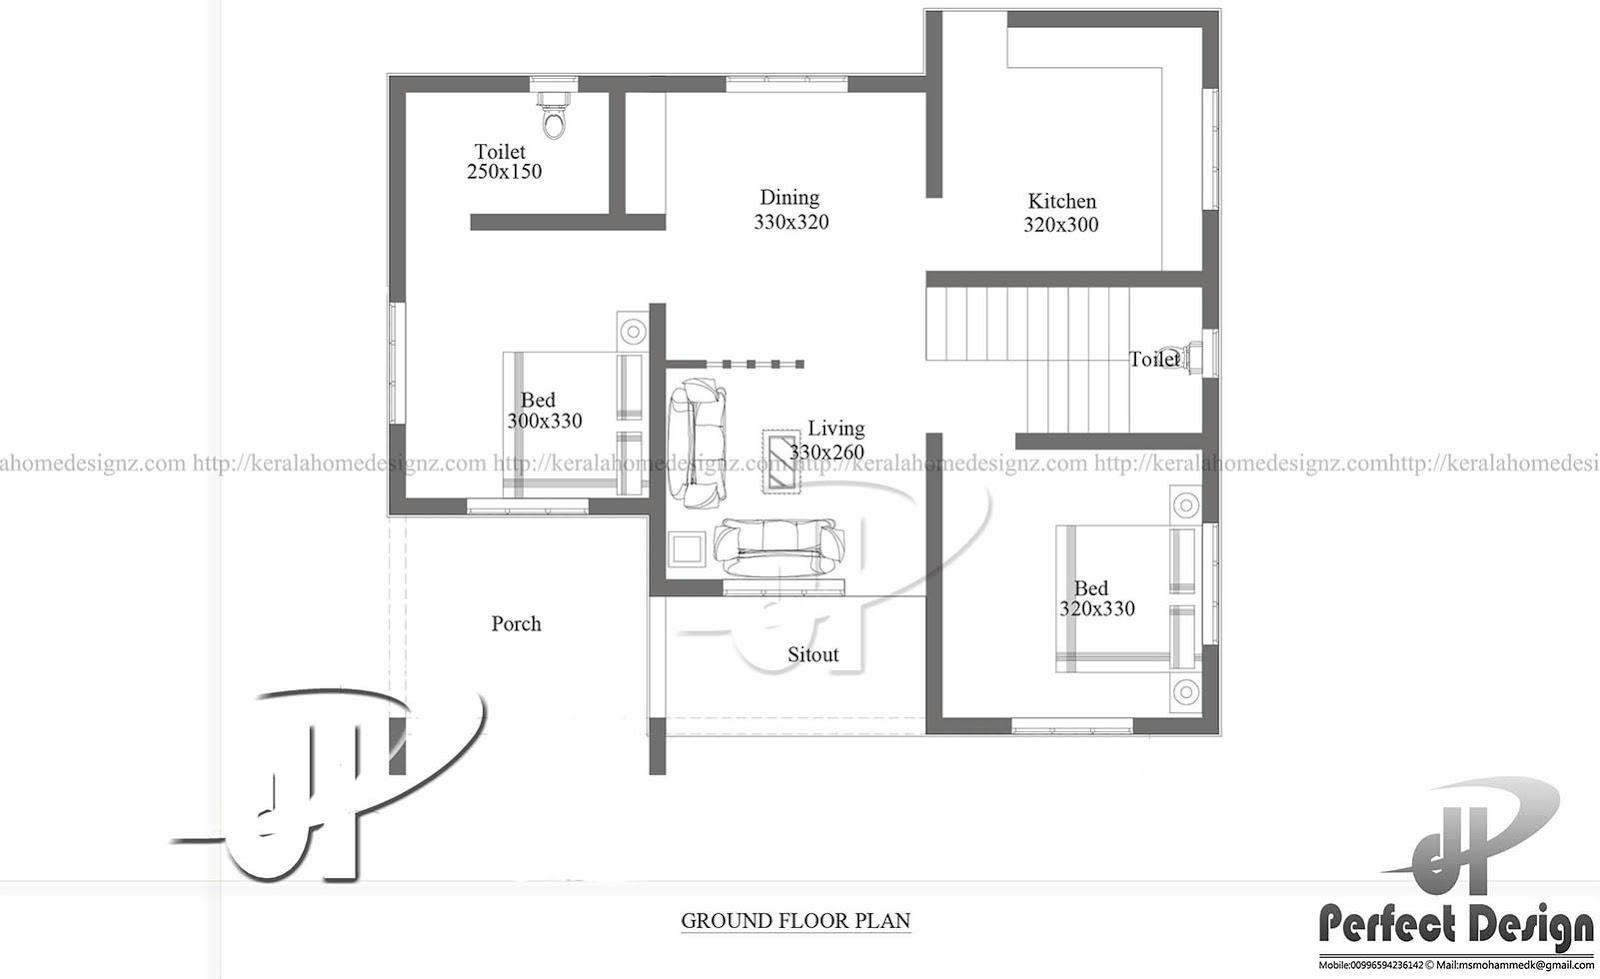 Ground Floor Plan With Dimensions In Meters